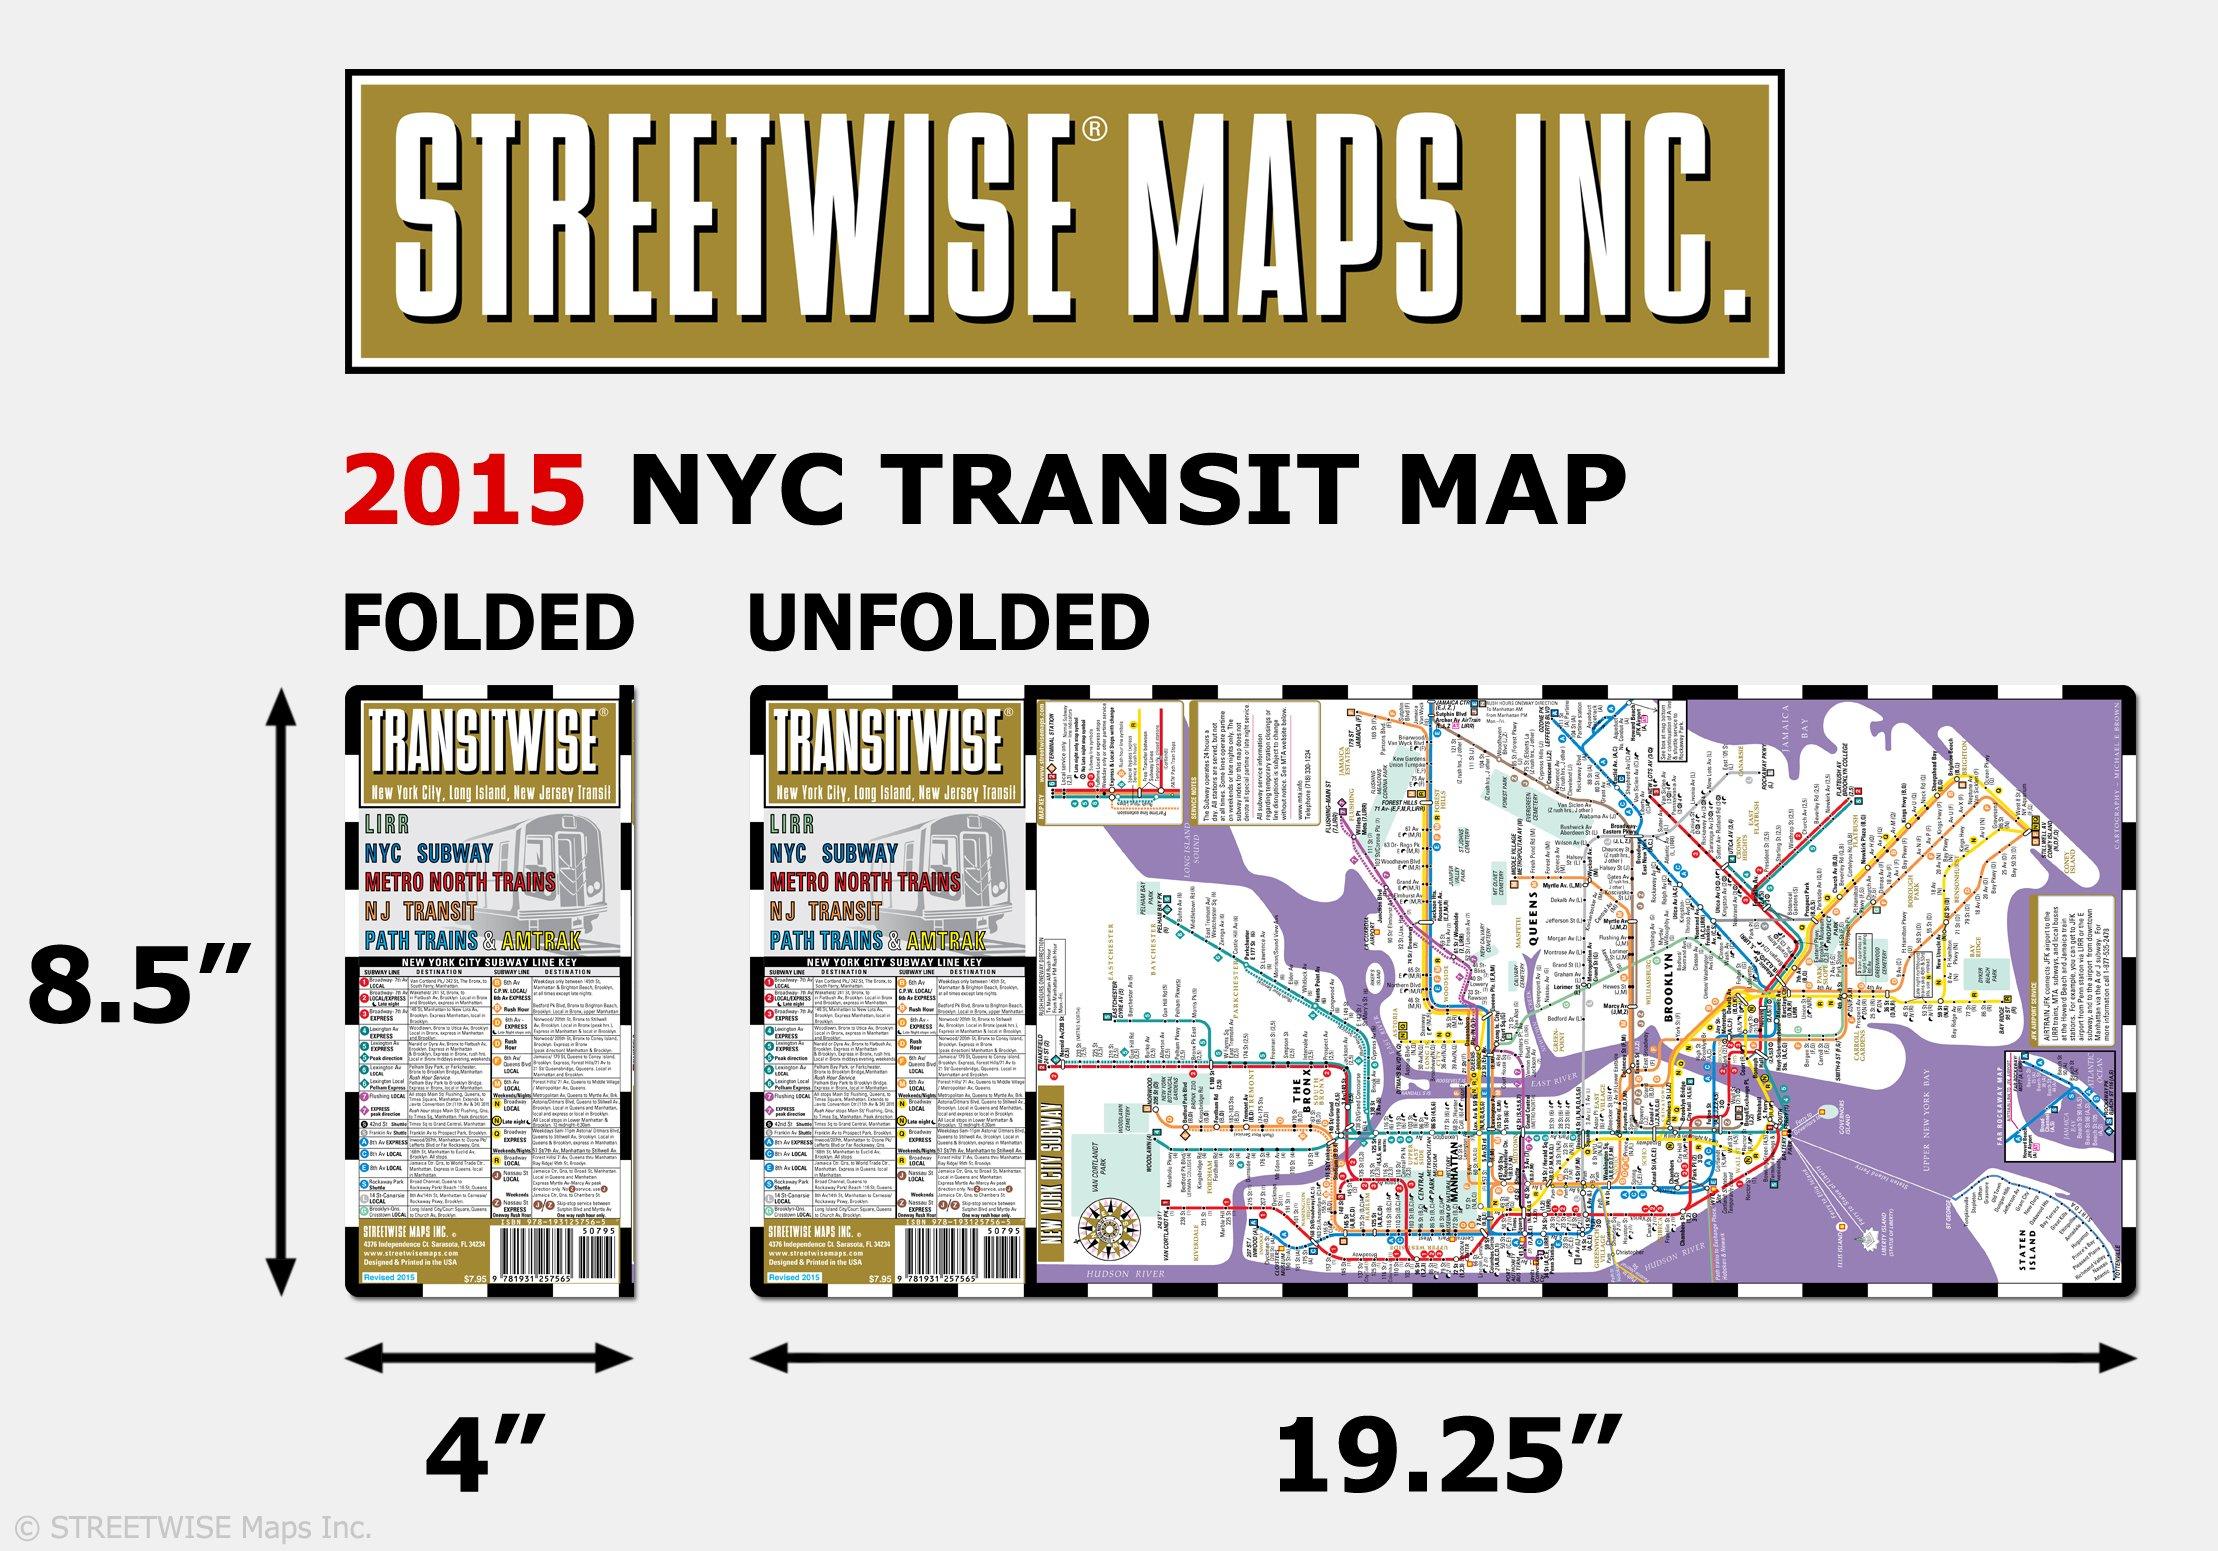 Mta Metro North Subway Map.Streetwise Transitwise New York City Subway Map Manhattan Subway